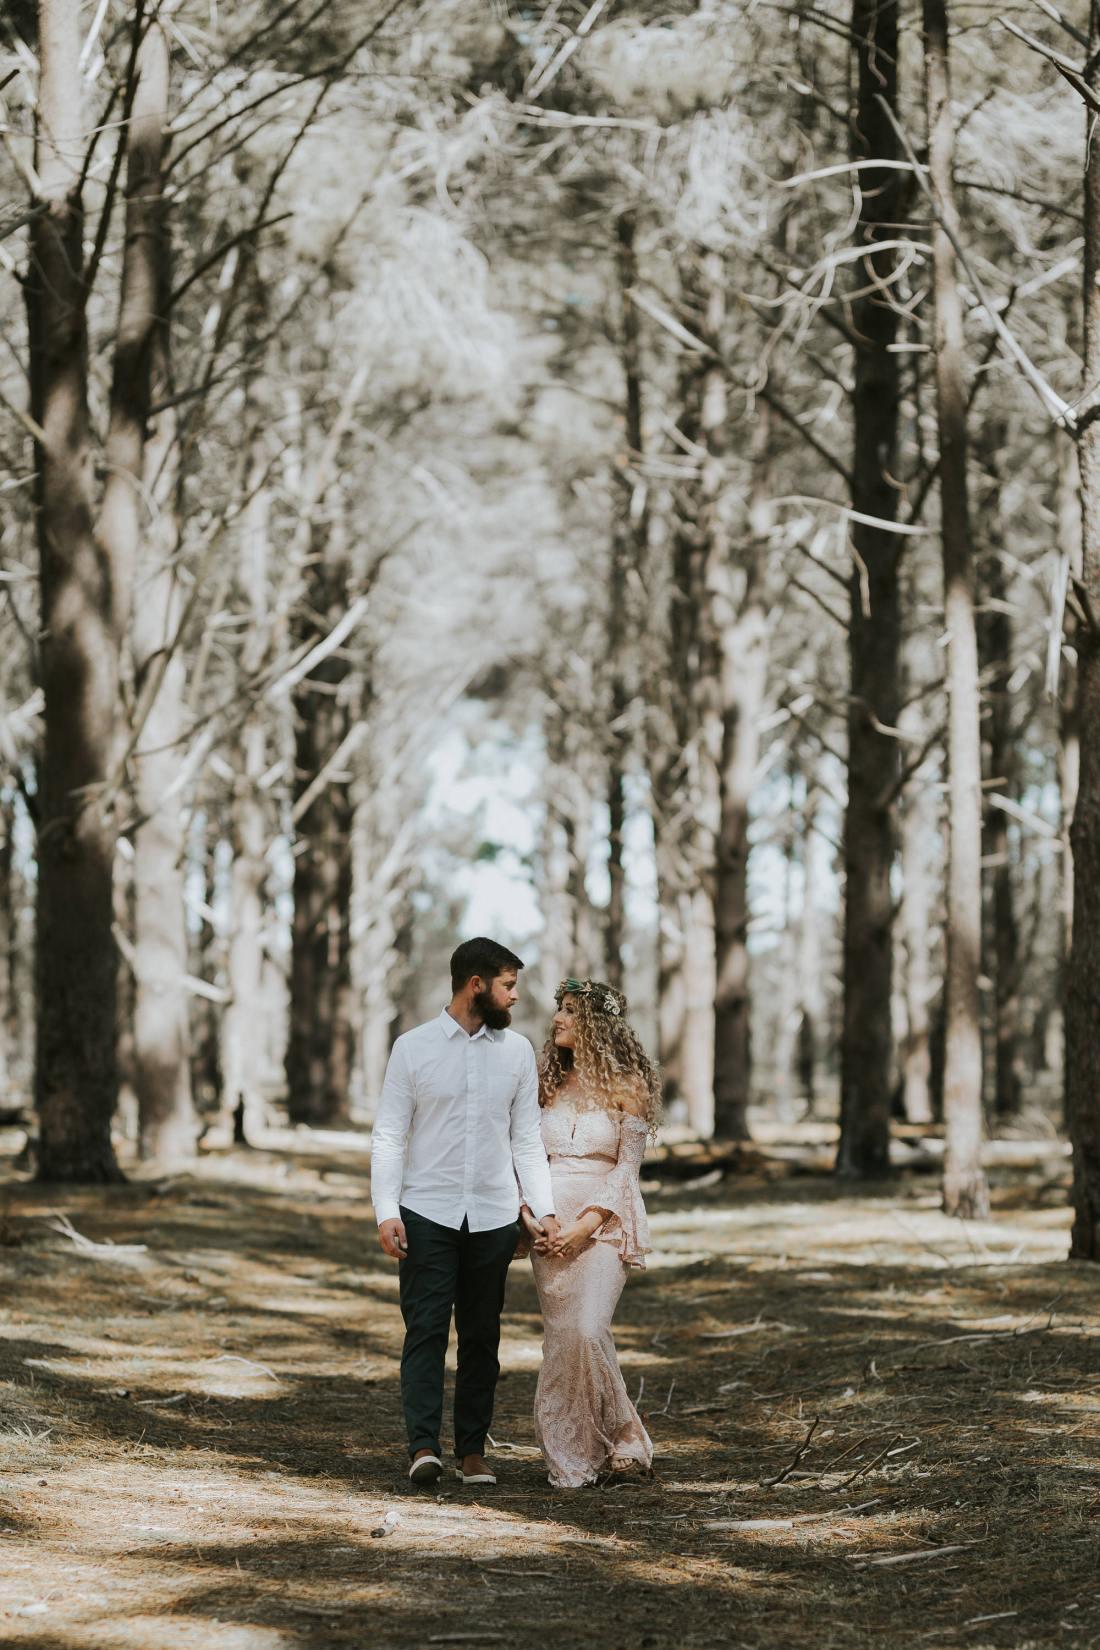 Sinéad + Shane | Pines Forrest Elopement | Ebony Blush Photography | Perth Wedding Photographer62